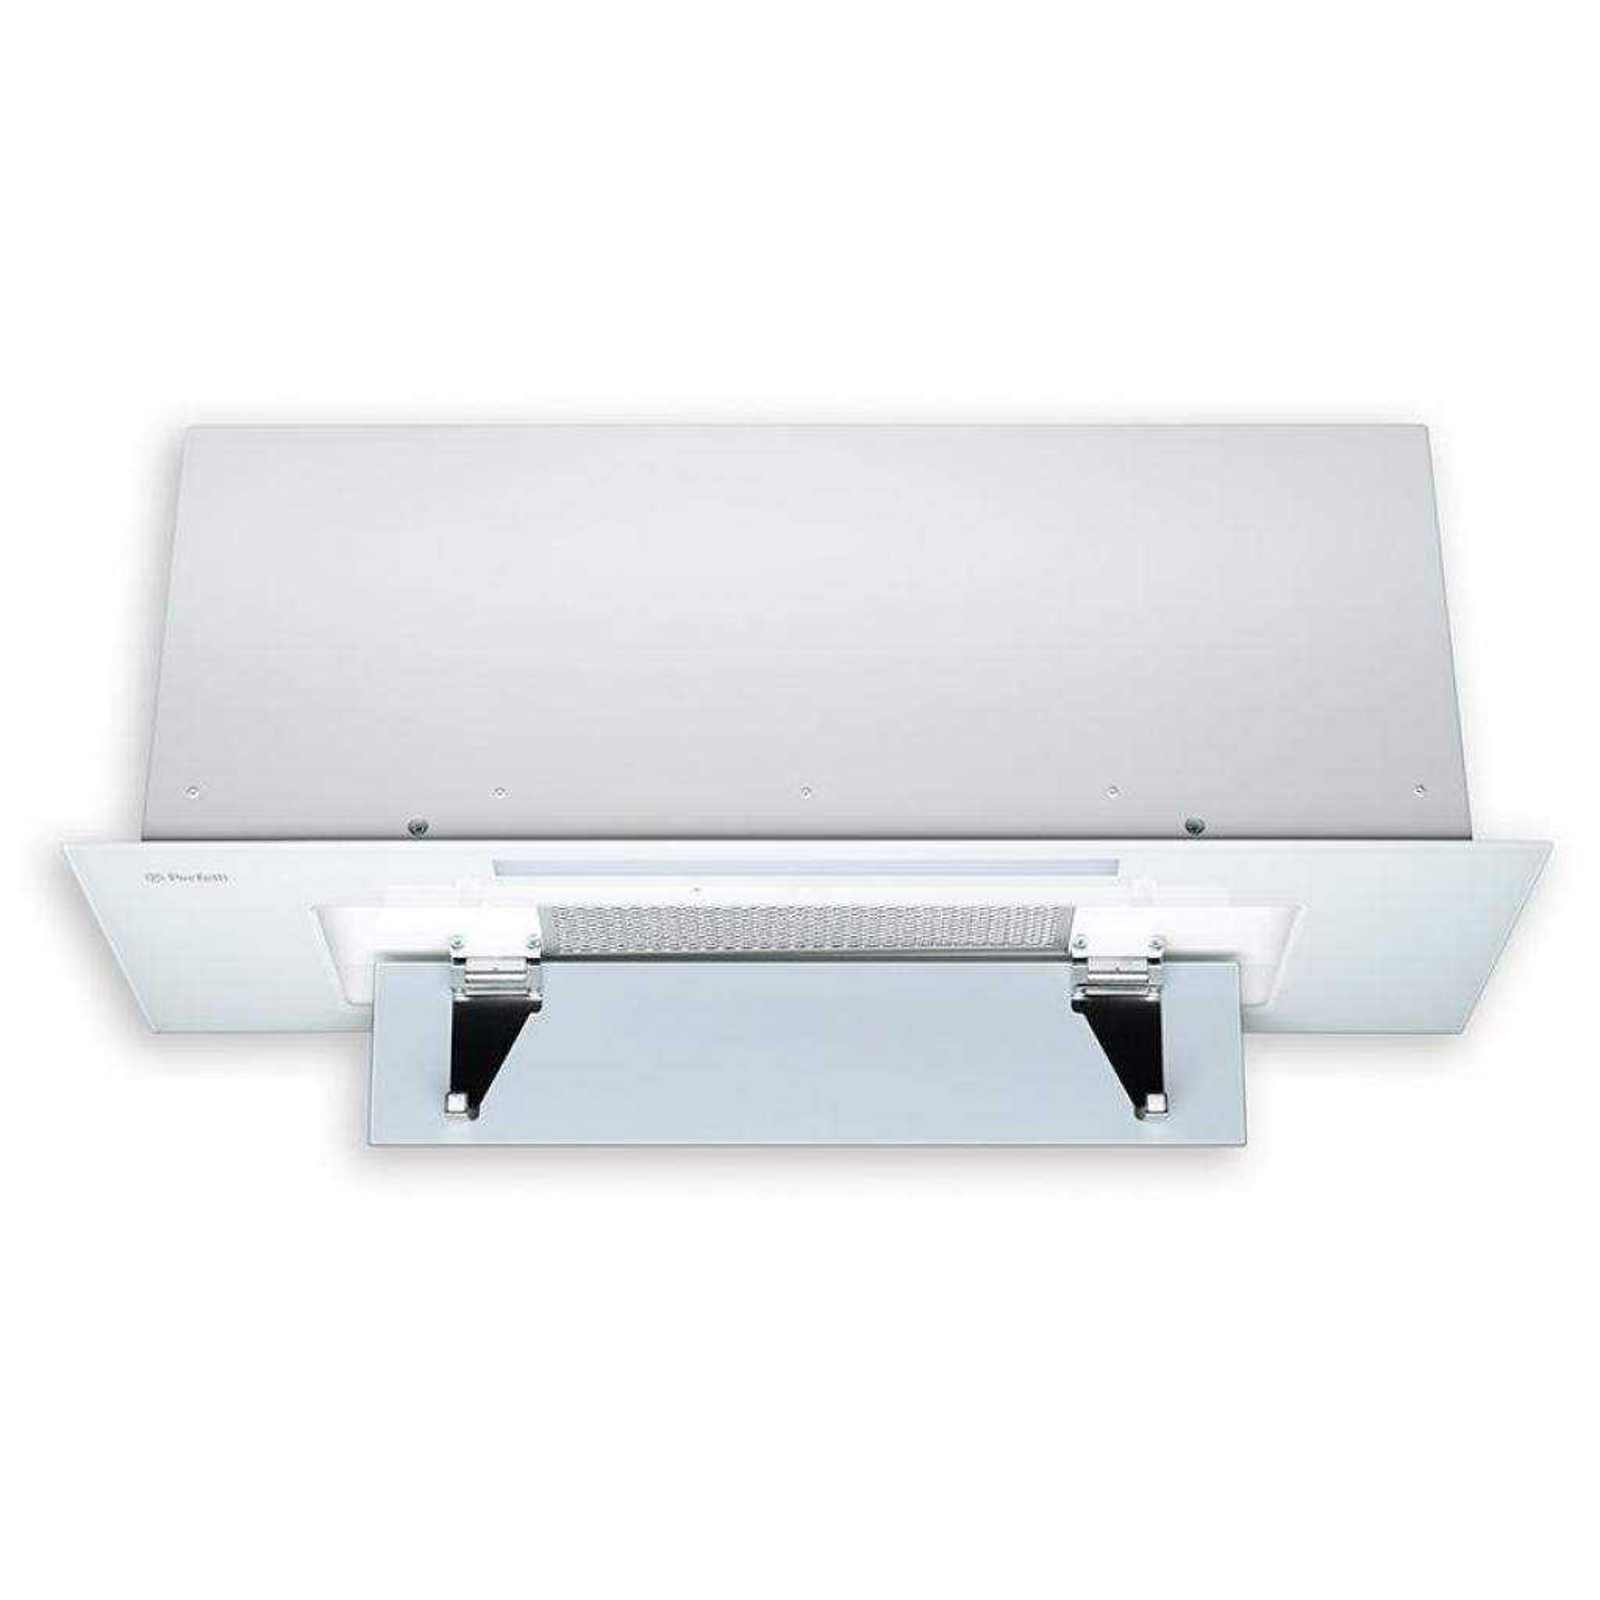 Вытяжка кухонная PERFELLI BISP 9973 A 1250 W LED Strip изображение 3